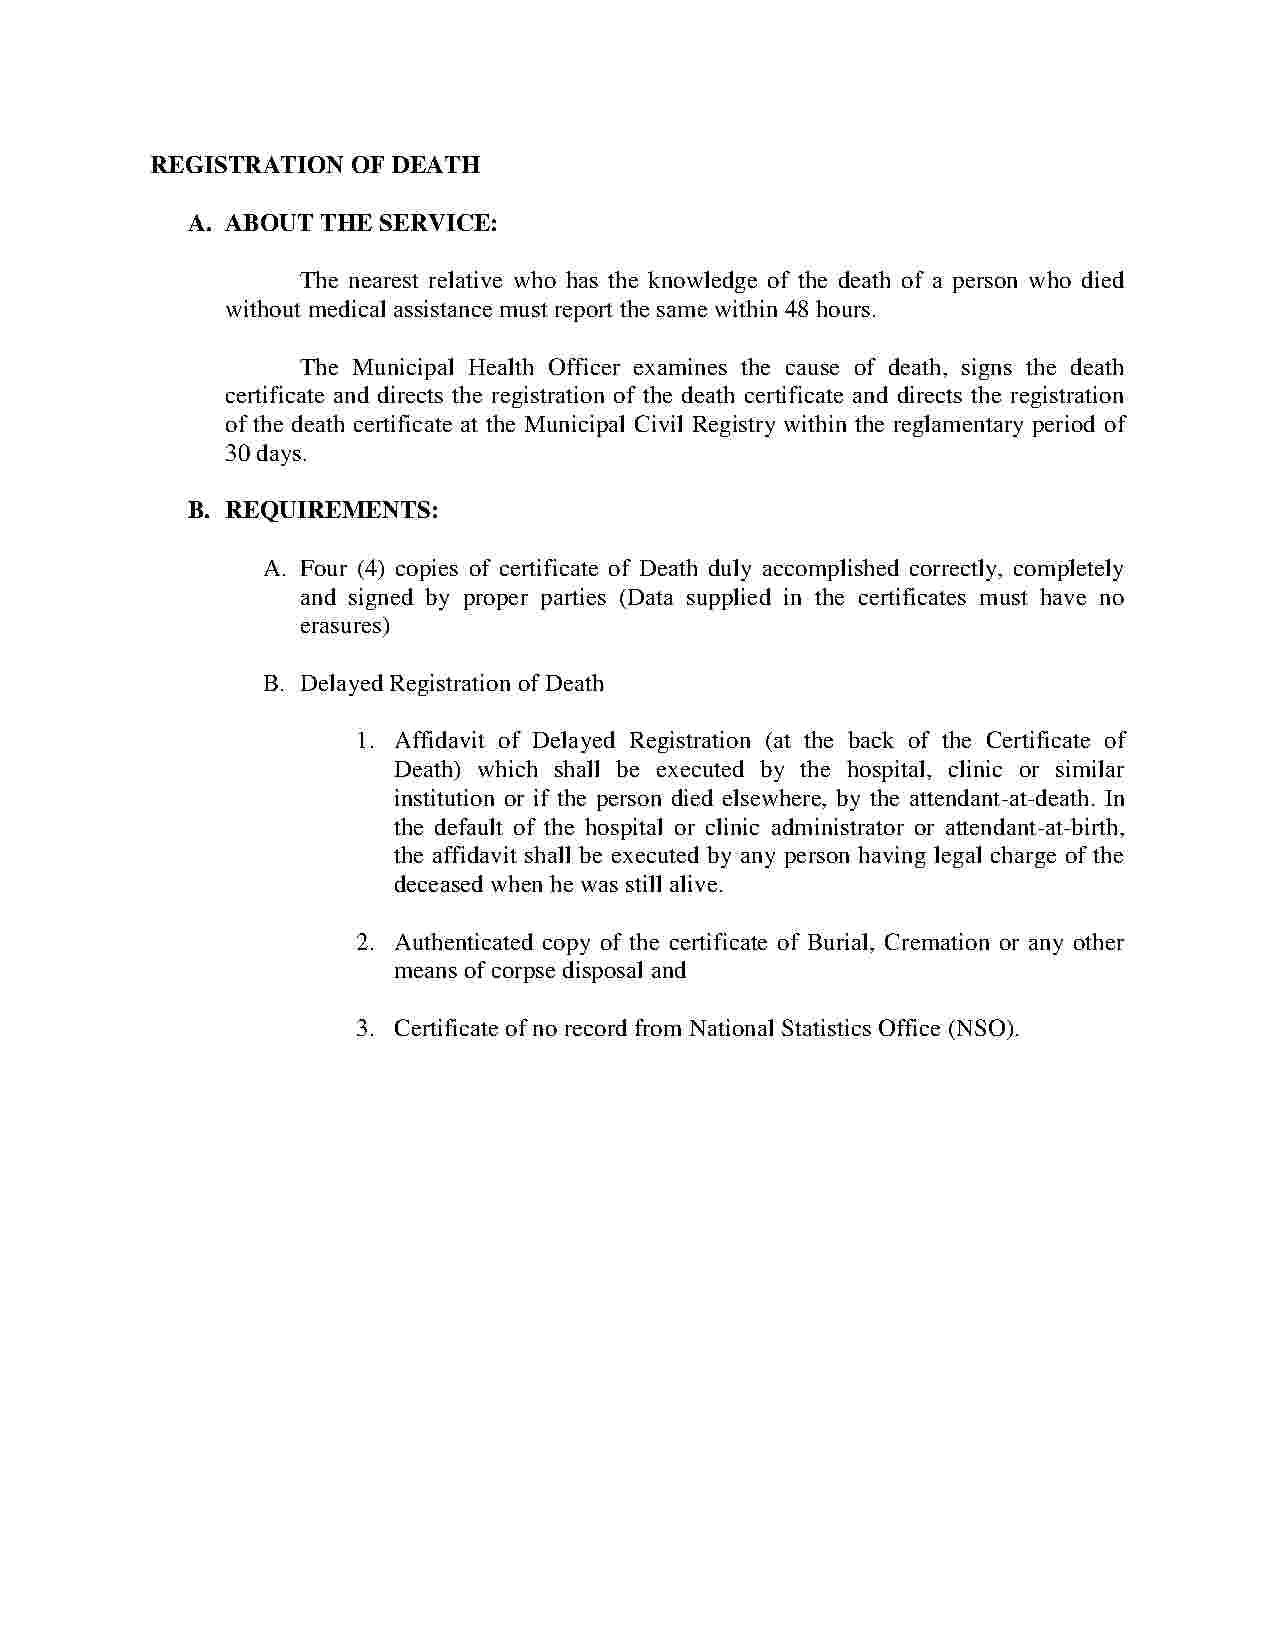 Templates Affidavit Of Death Templates Hunter Affidavit Of Death